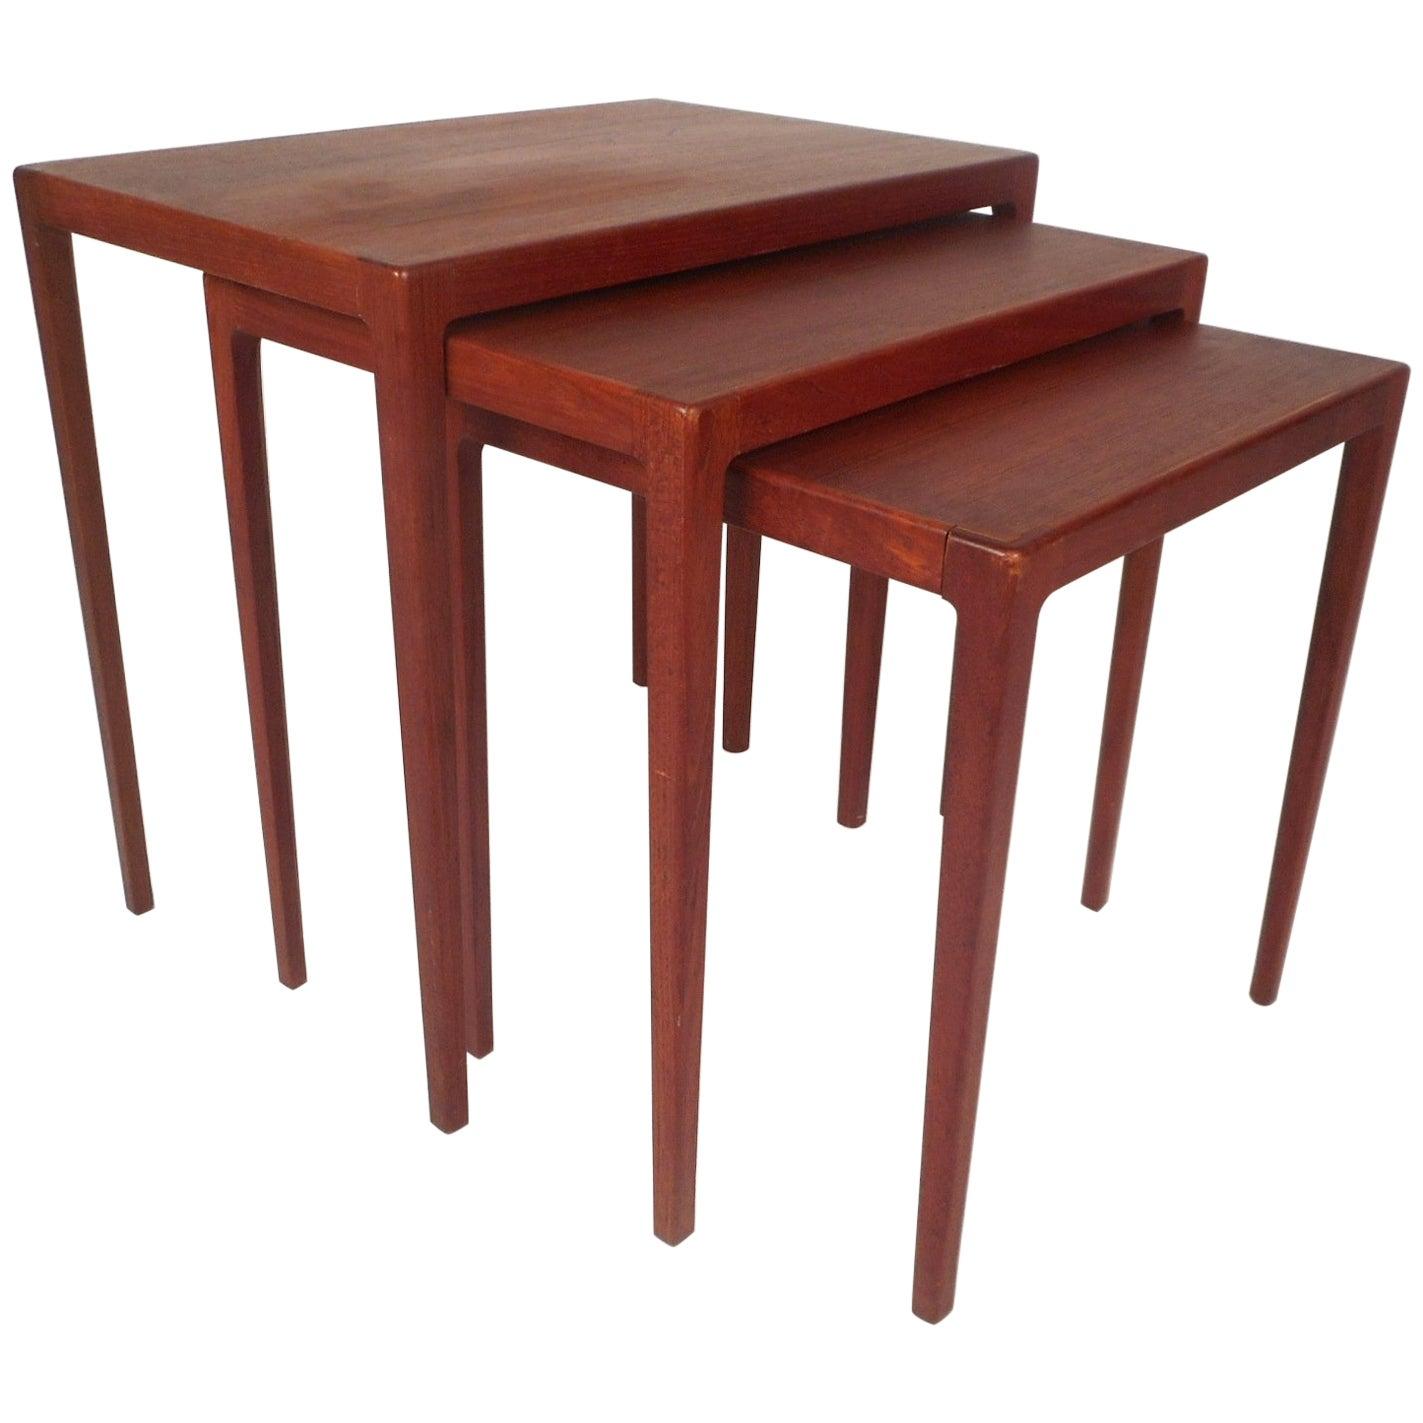 Set of Three Mid-Century Modern Danish Teak Nesting Tables by Ludvig Pontoppidan